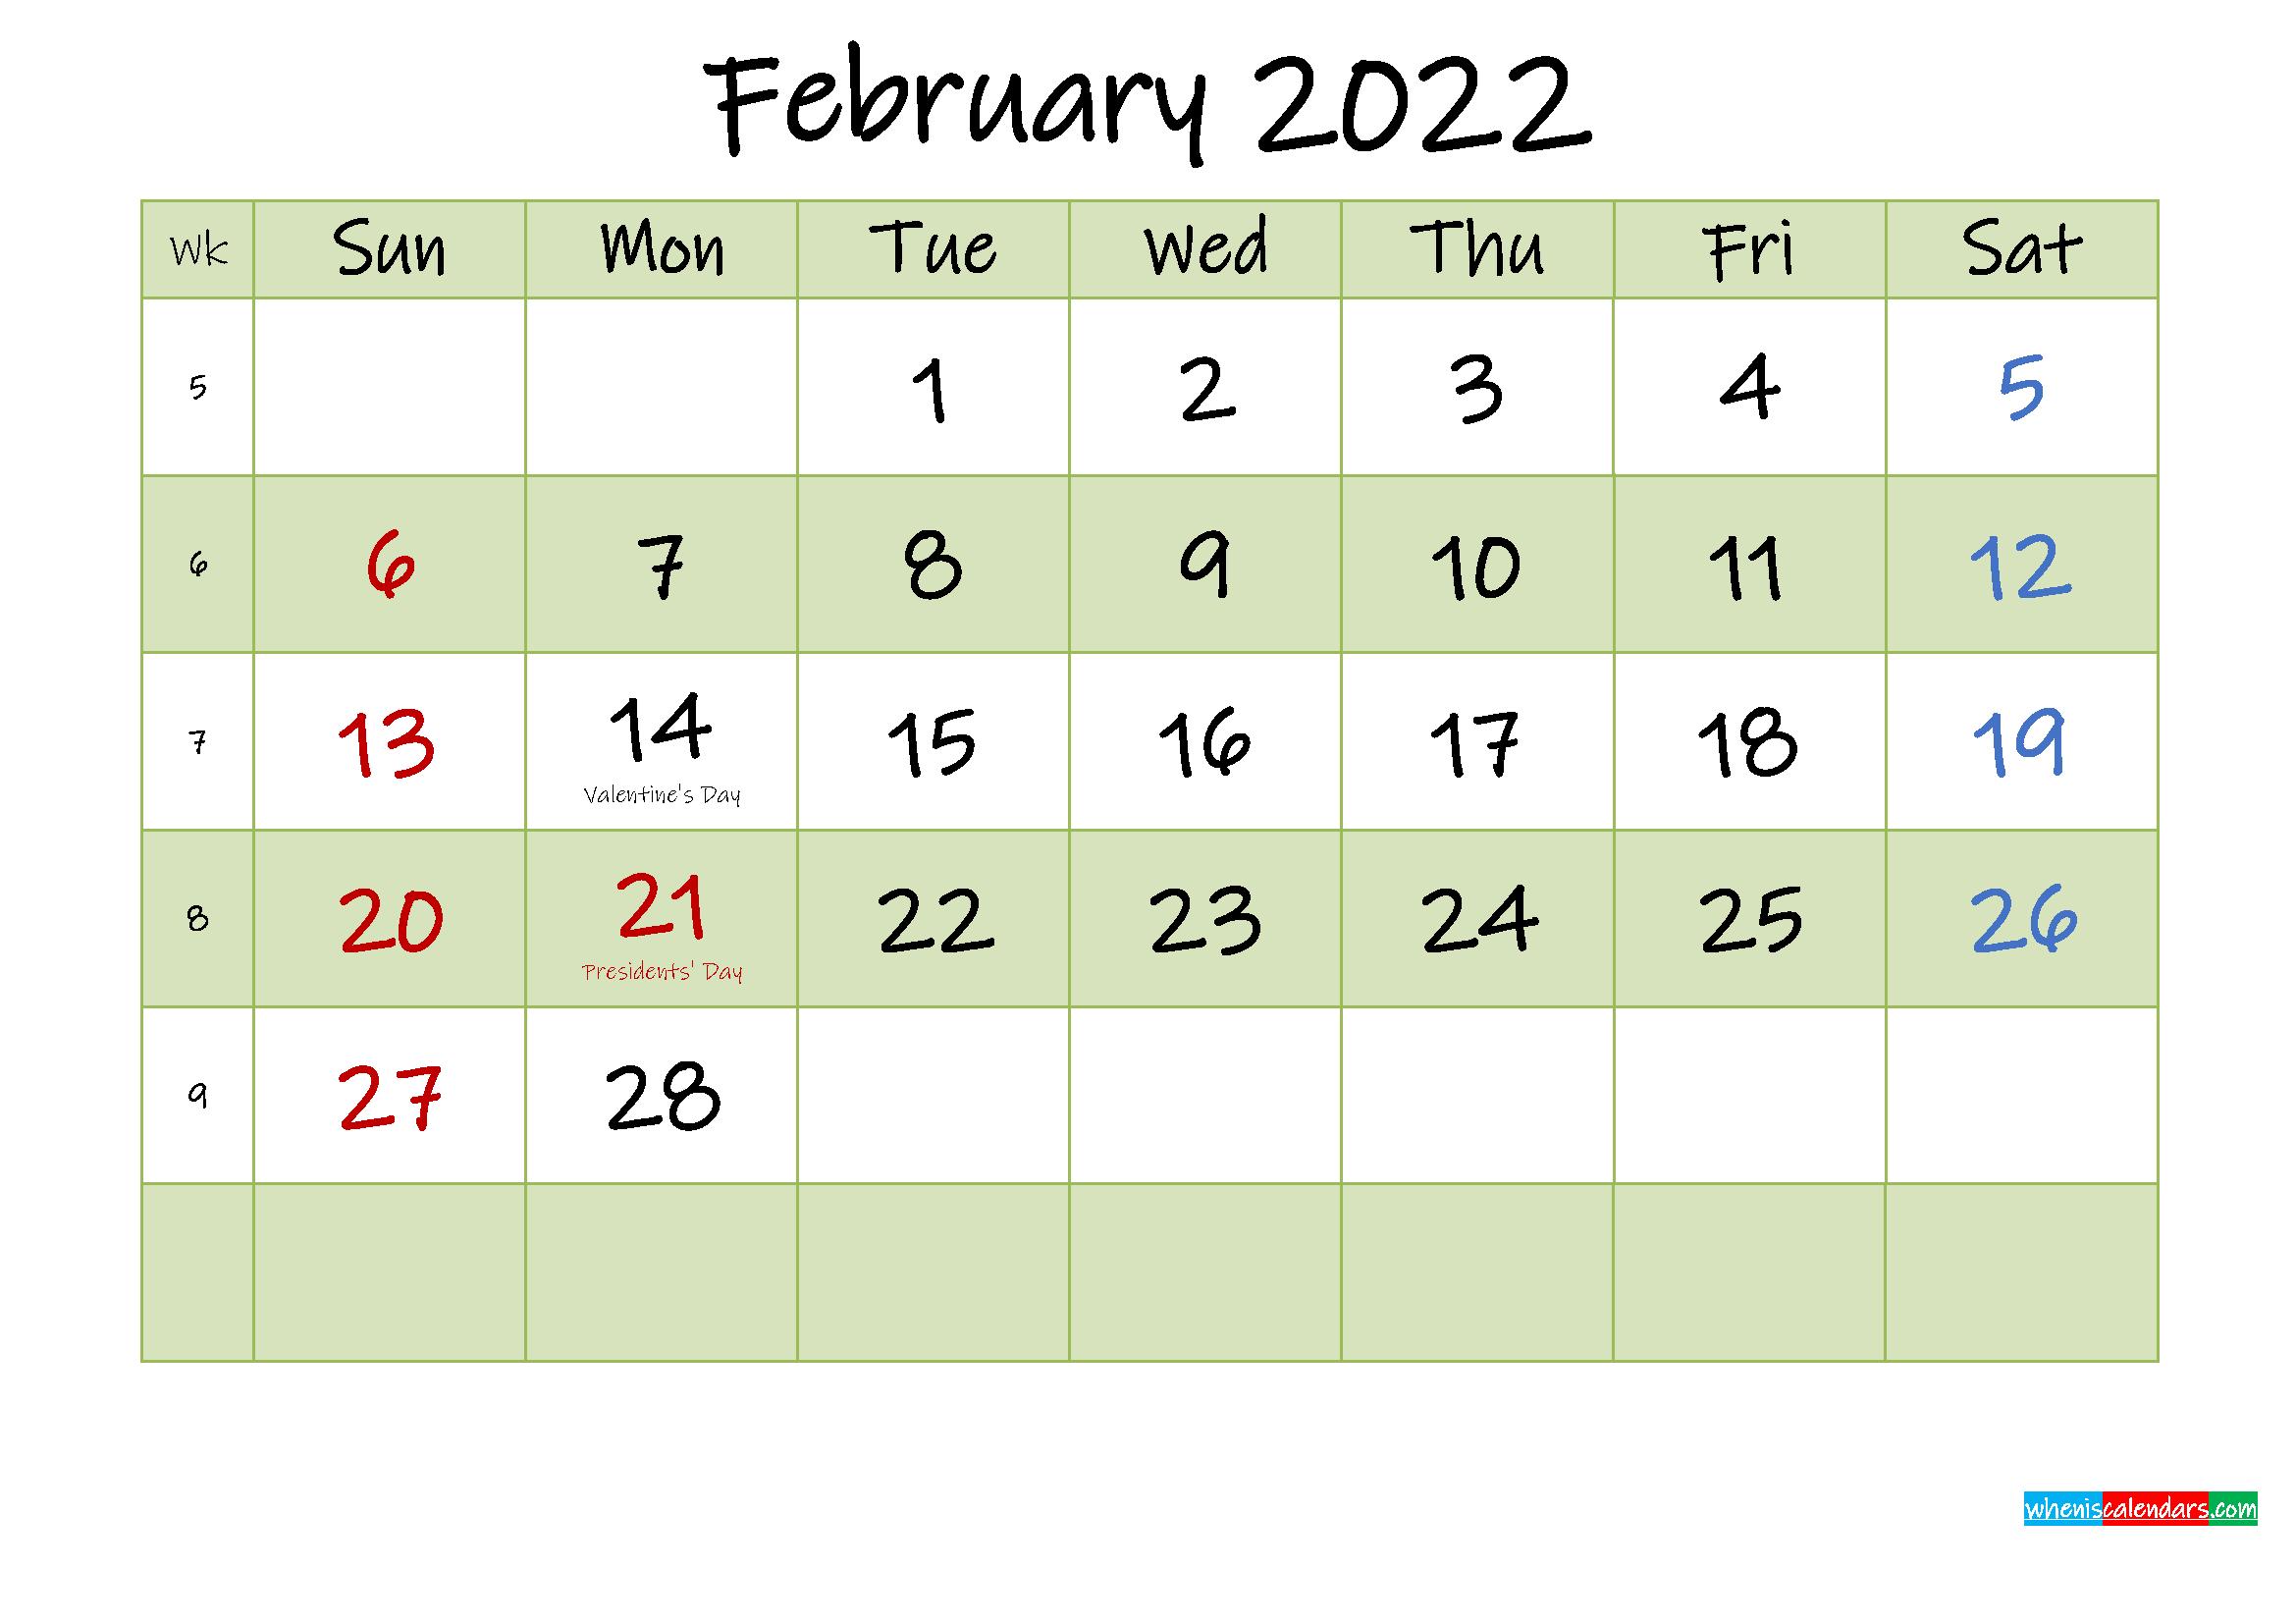 February 2022 Calendar With Holidays Printable - Template Inside Feb 2022 Calendar Printable Free